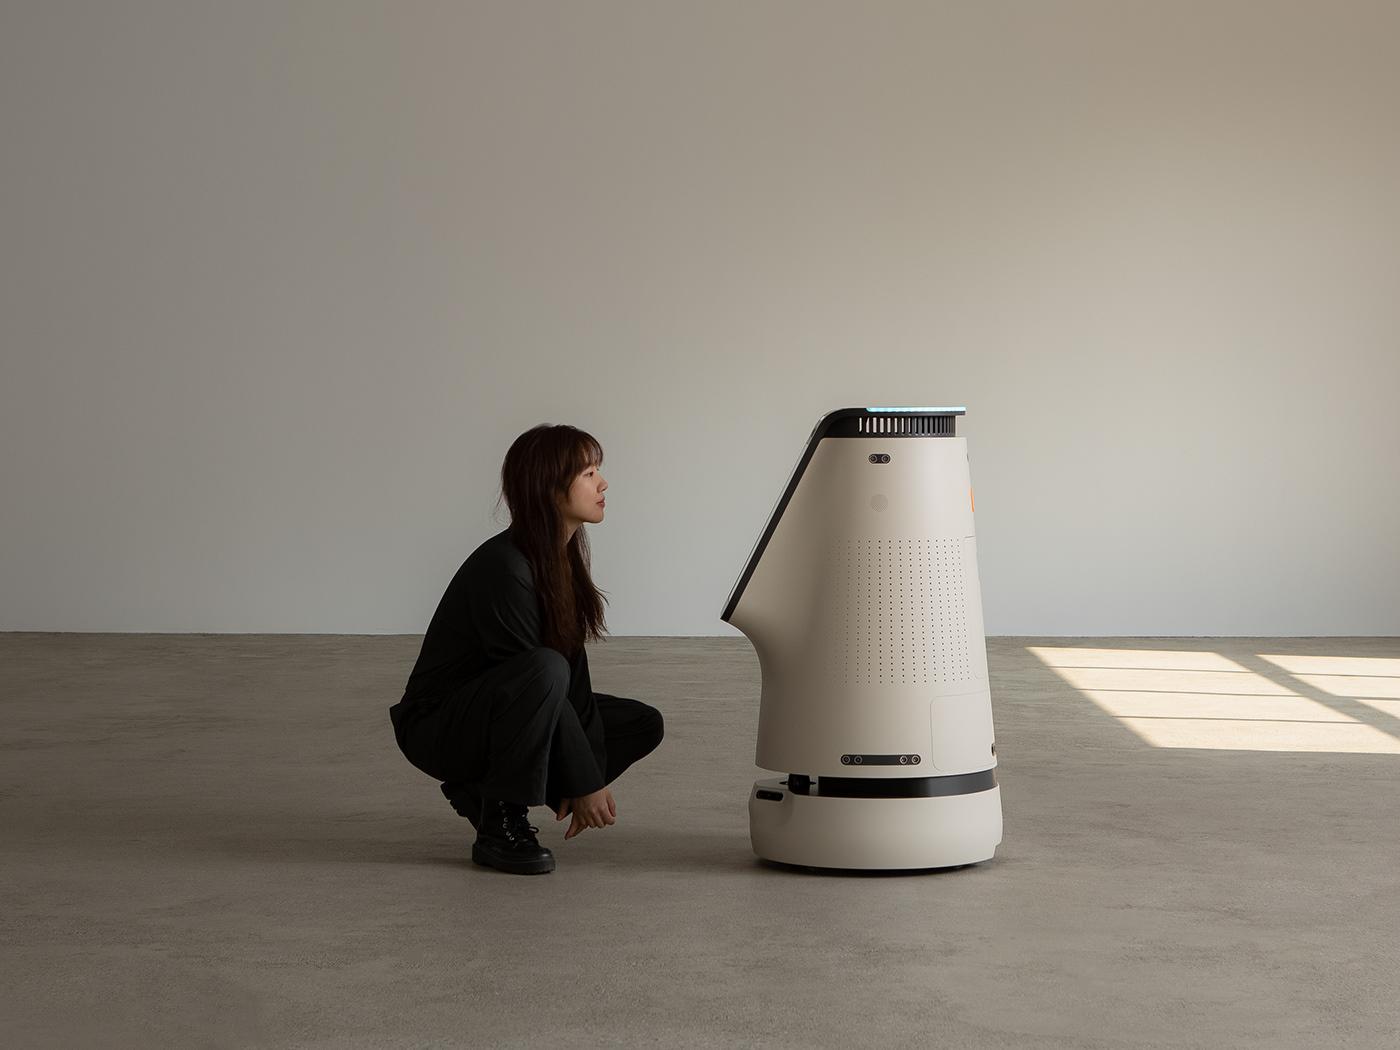 ai air purifier Autonomous bebop purifier robot sensor zetabank